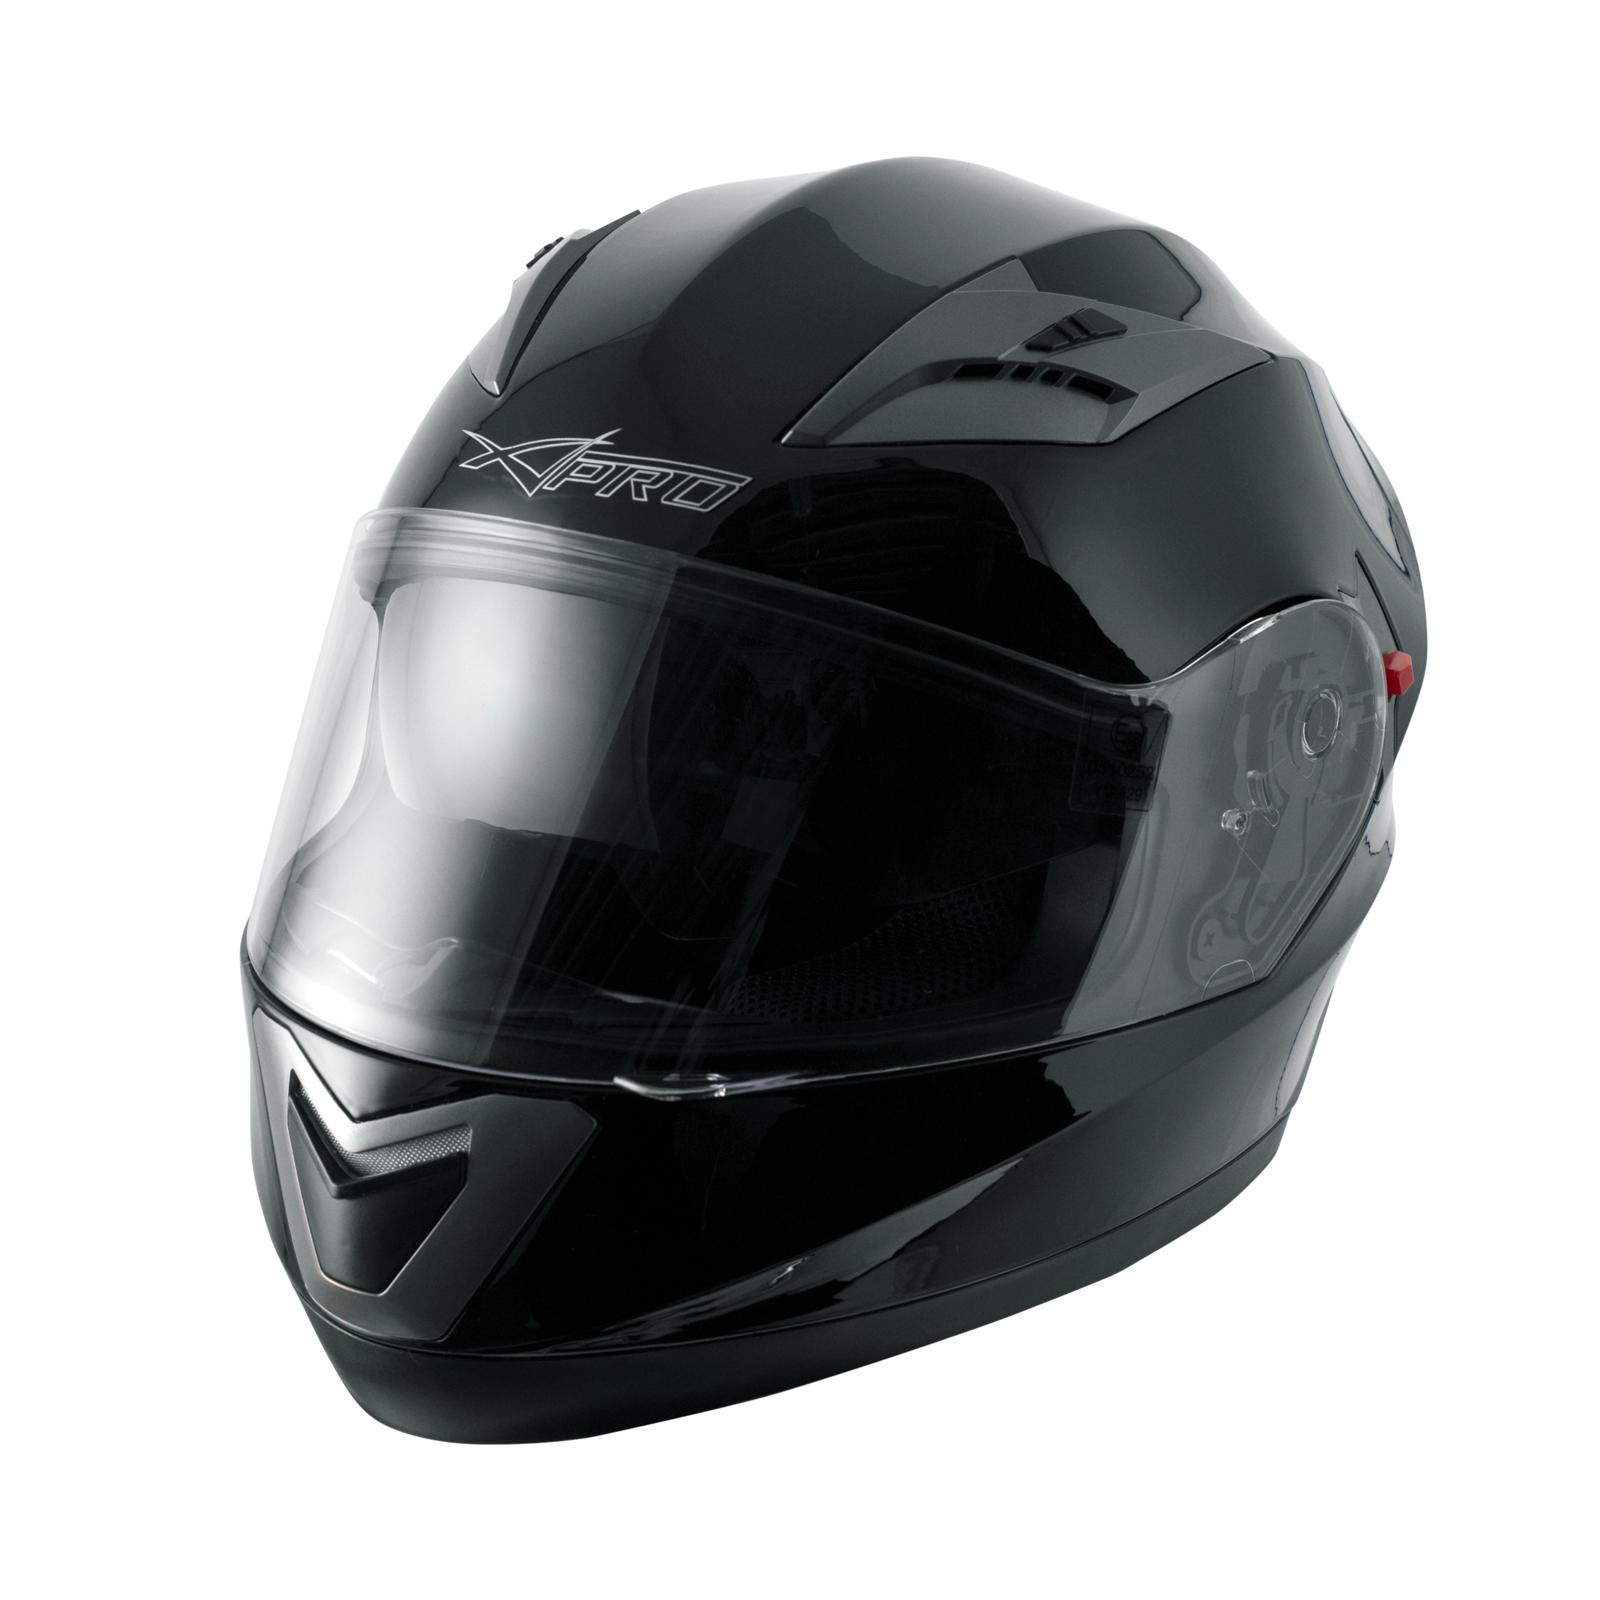 miniatura 5 - Integral-Helm-Motorrad-Roller-Sonnenblende-Touring-Schwarz